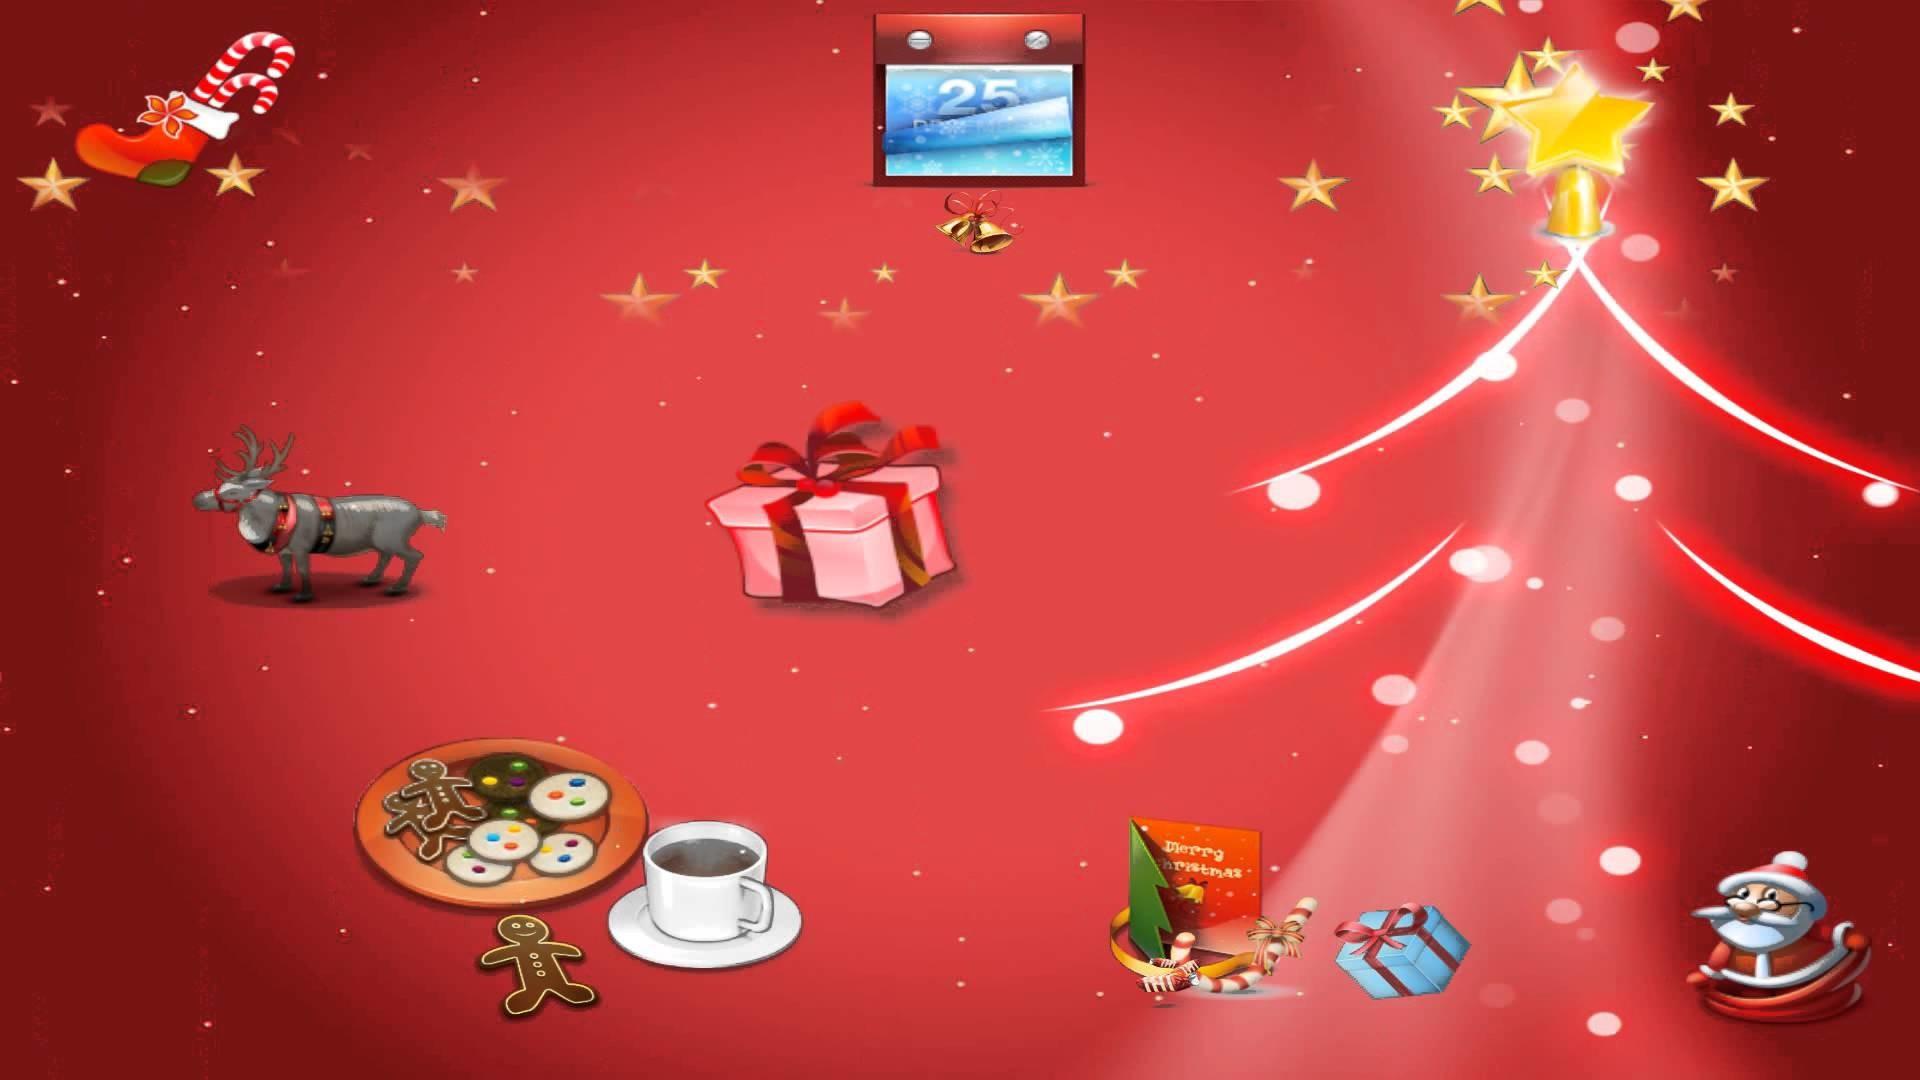 Res: 1920x1080, Merry Christmas Animated Wallpaper 2.0 http://www.desktopanimated.com -  YouTube